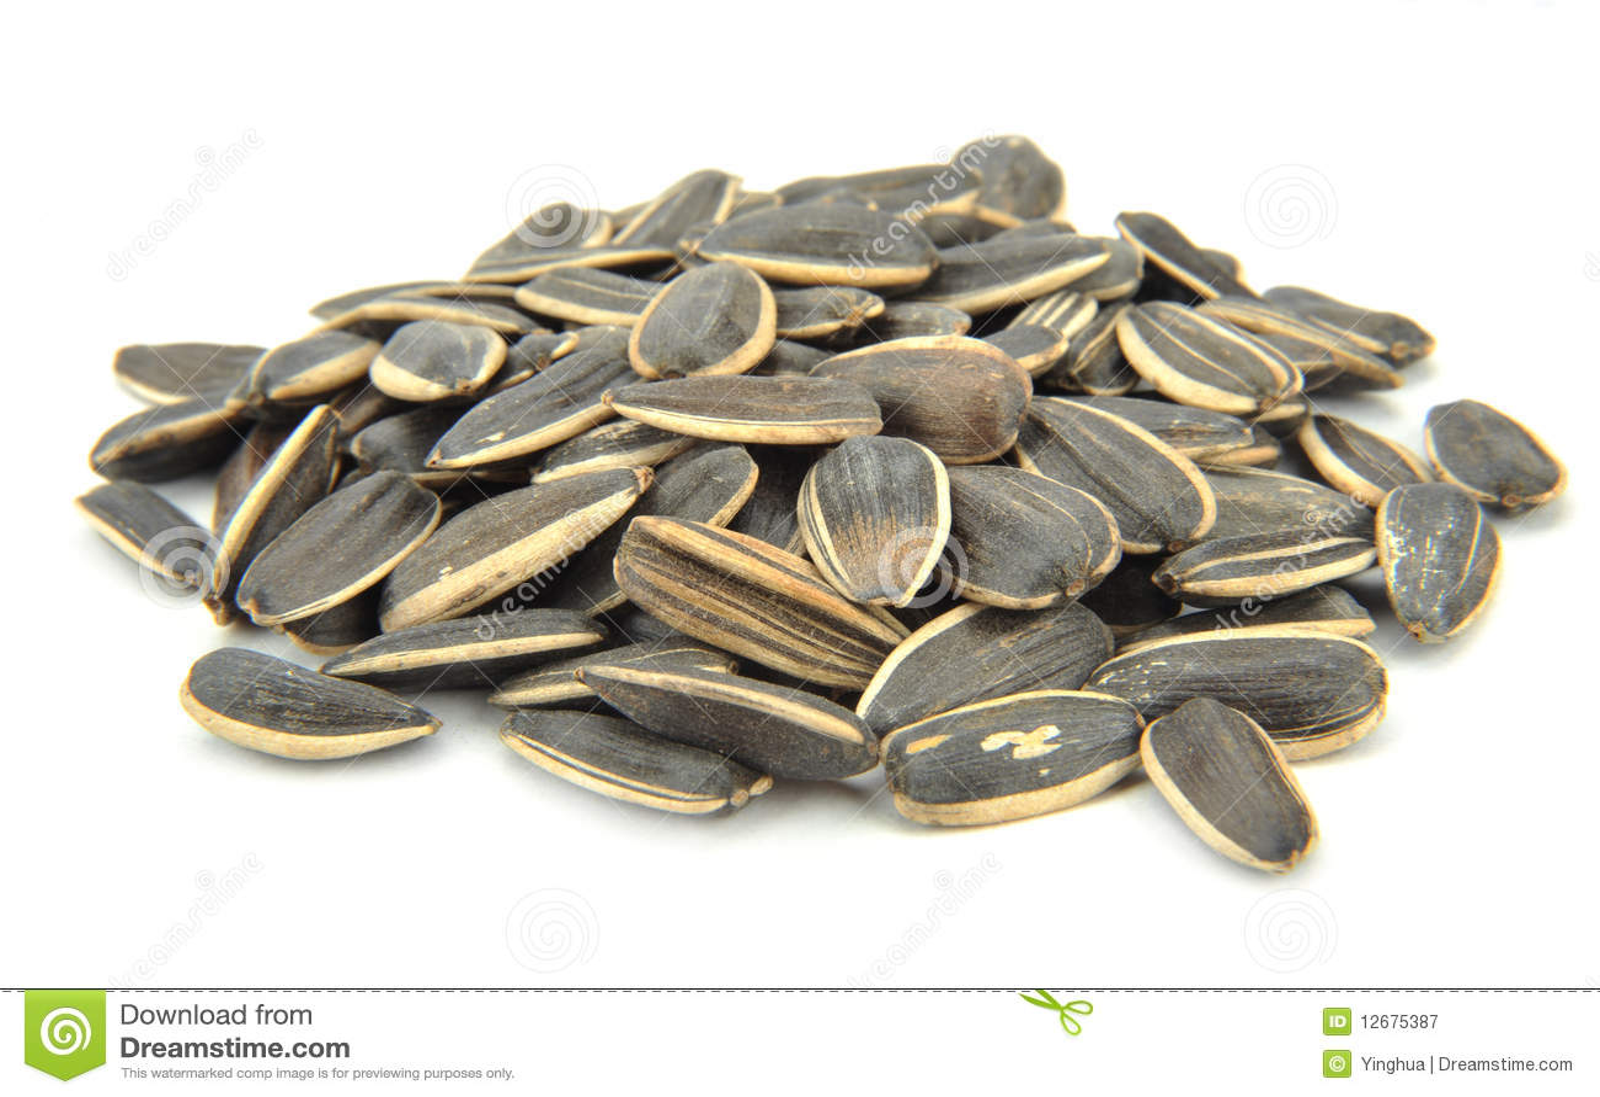 david sunflower seeds clipart - photo #20